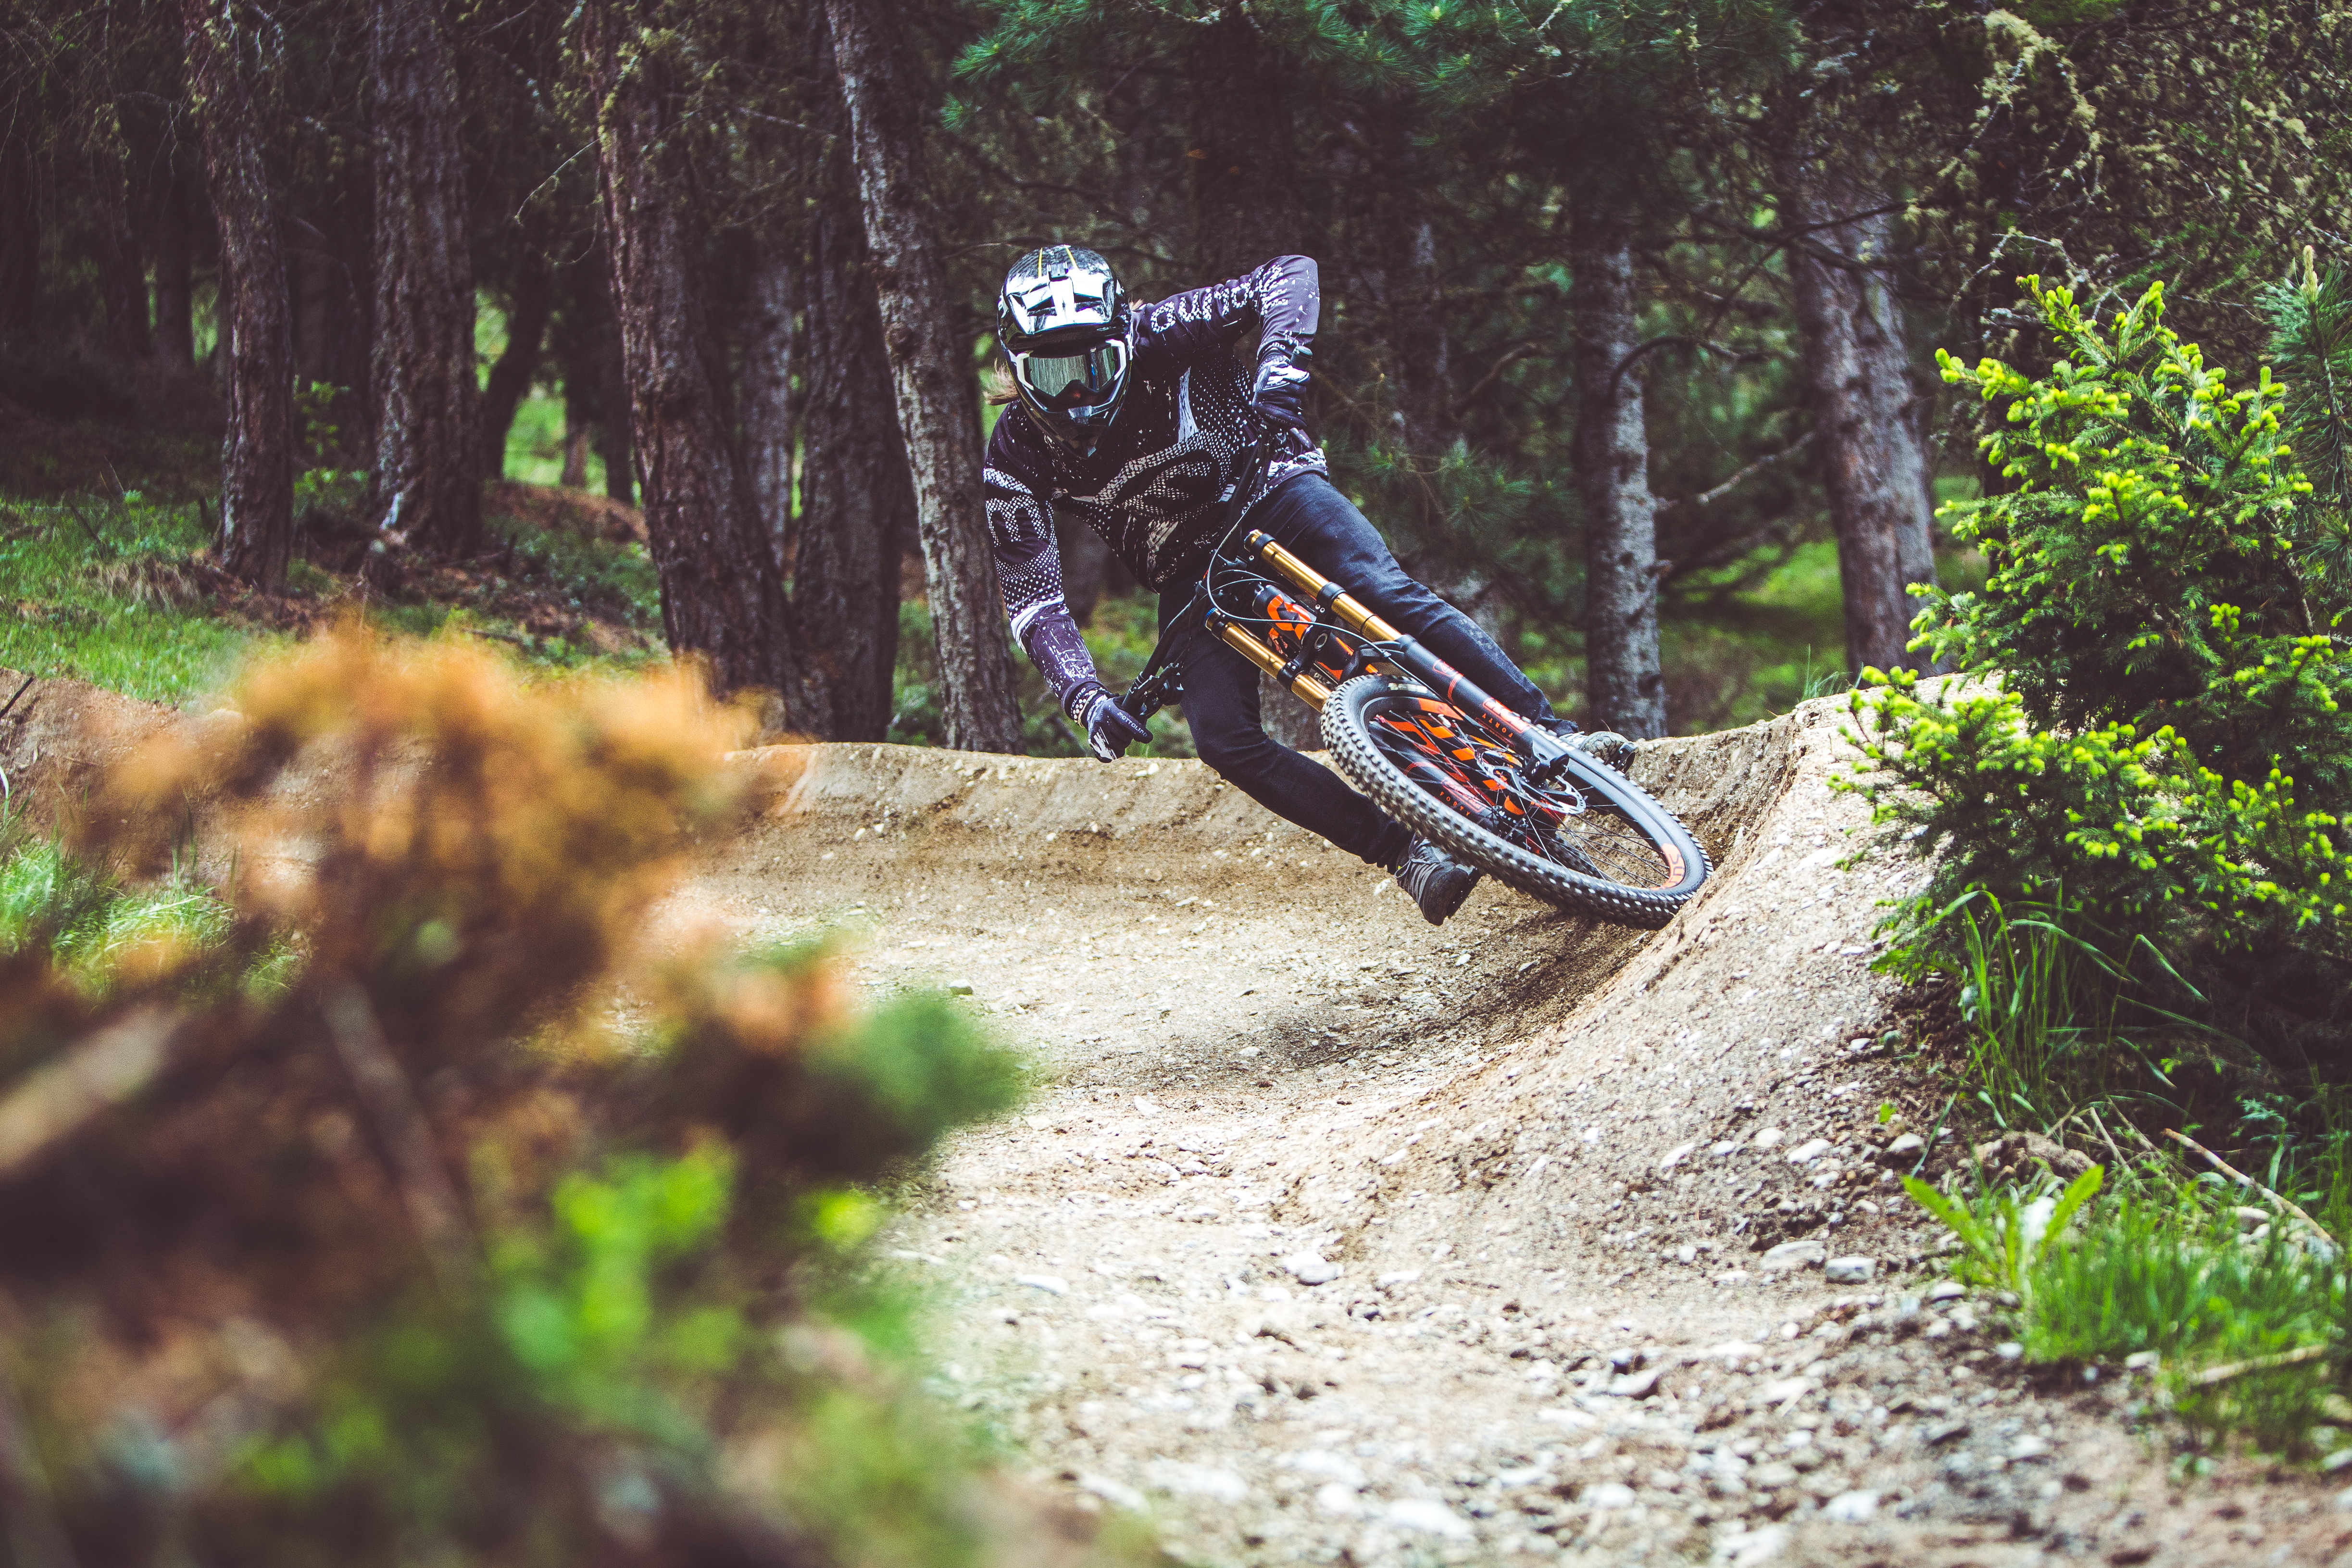 Bikepark Pro al Mottolino